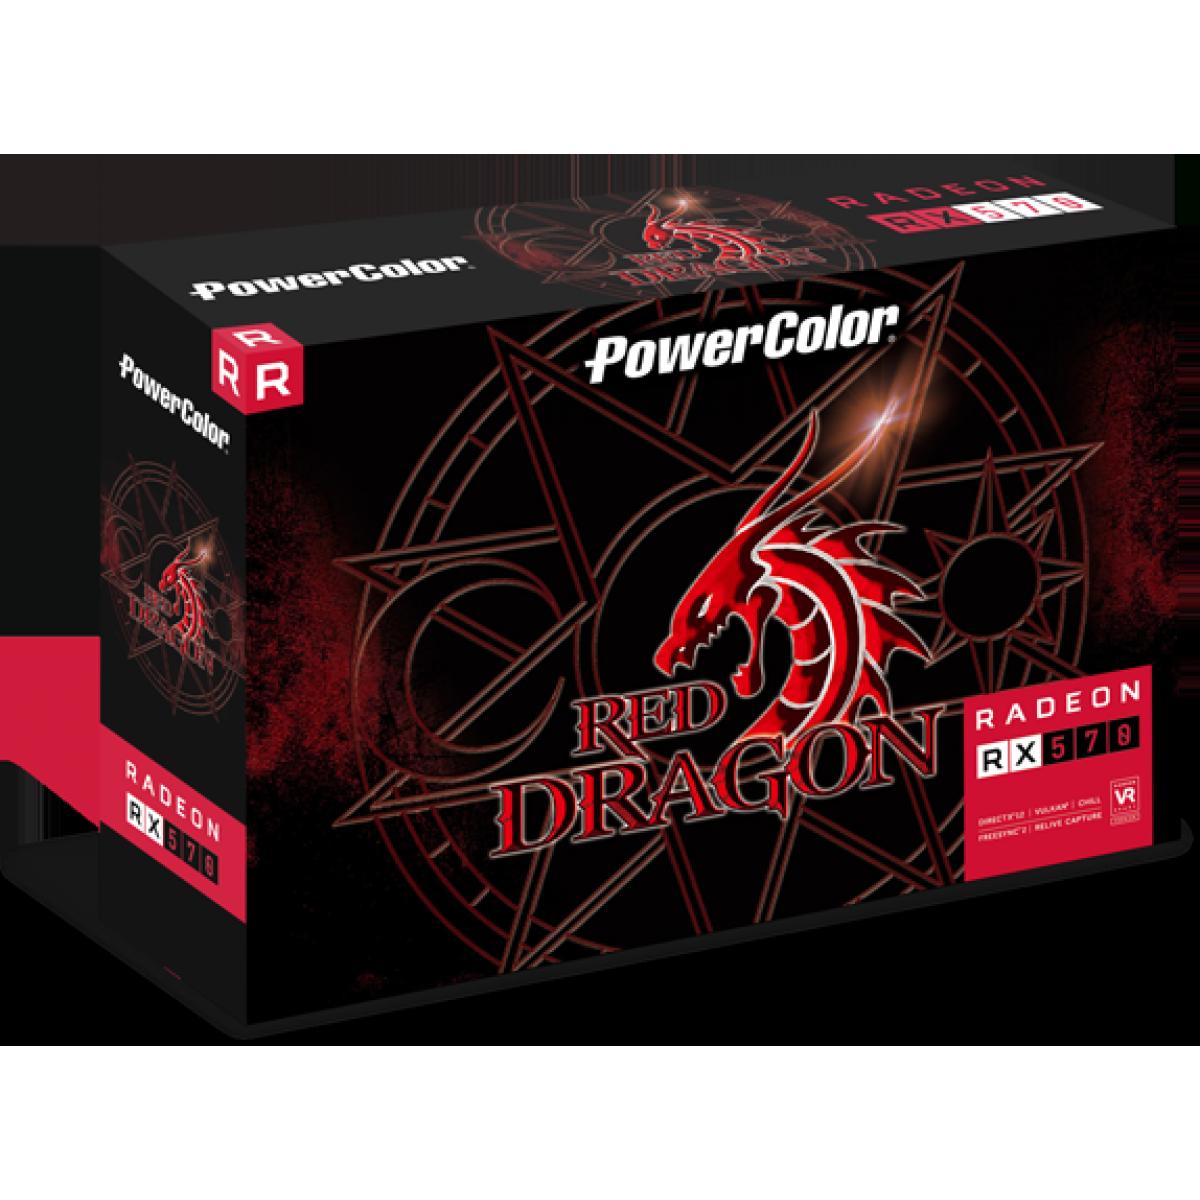 Placa de Vídeo PowerColor Radeon RX 570 Red Dragon Dual, 4GB GDDR5, 256Bit, AXRX 570 4GBD5-DHDV3/OC - Open Box